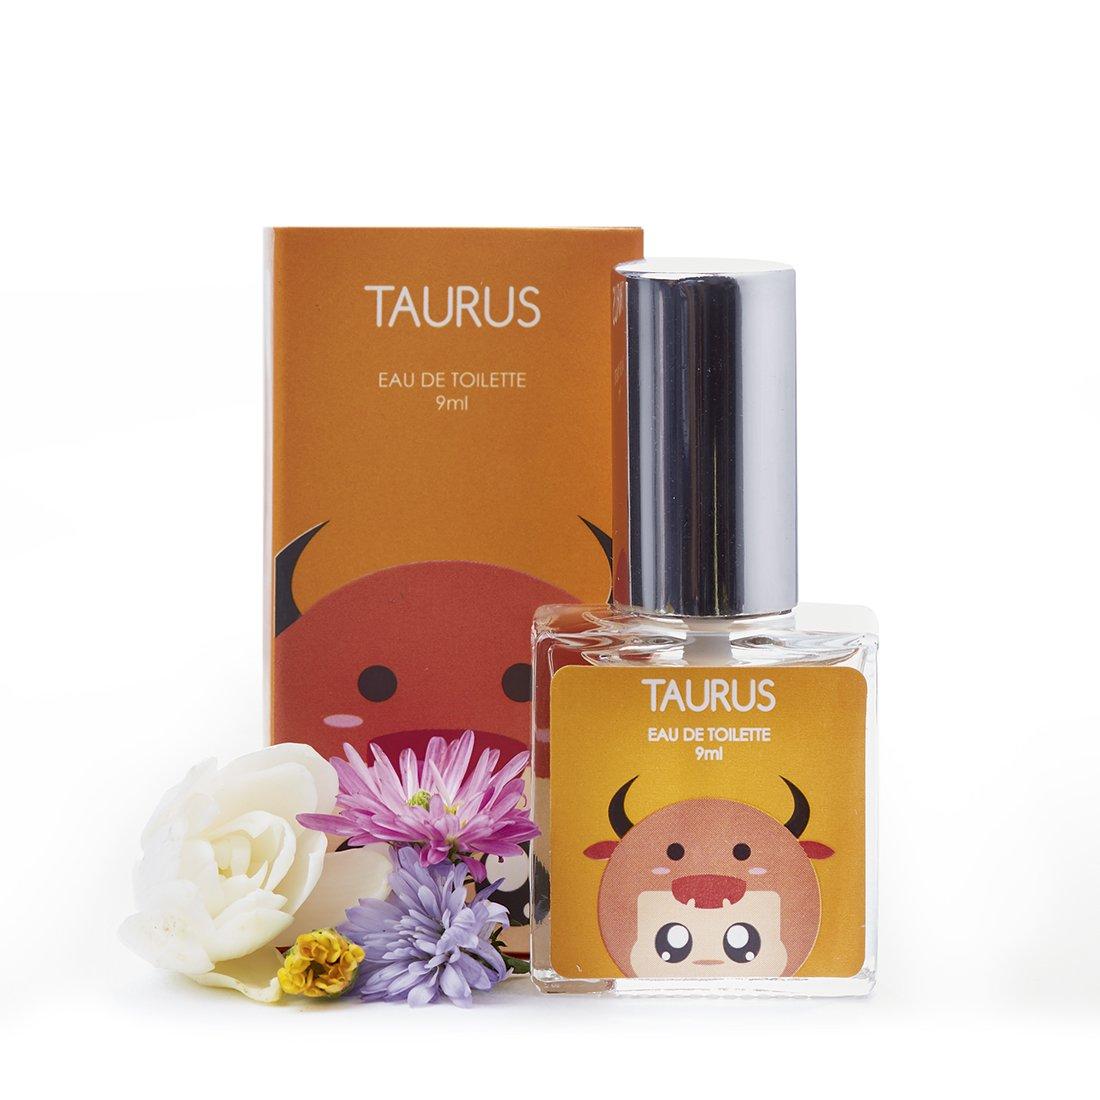 Ini-Dia-Rekomendasi-Parfum-Sesuai-Zodiak-Dari-Brunbrun-taurus